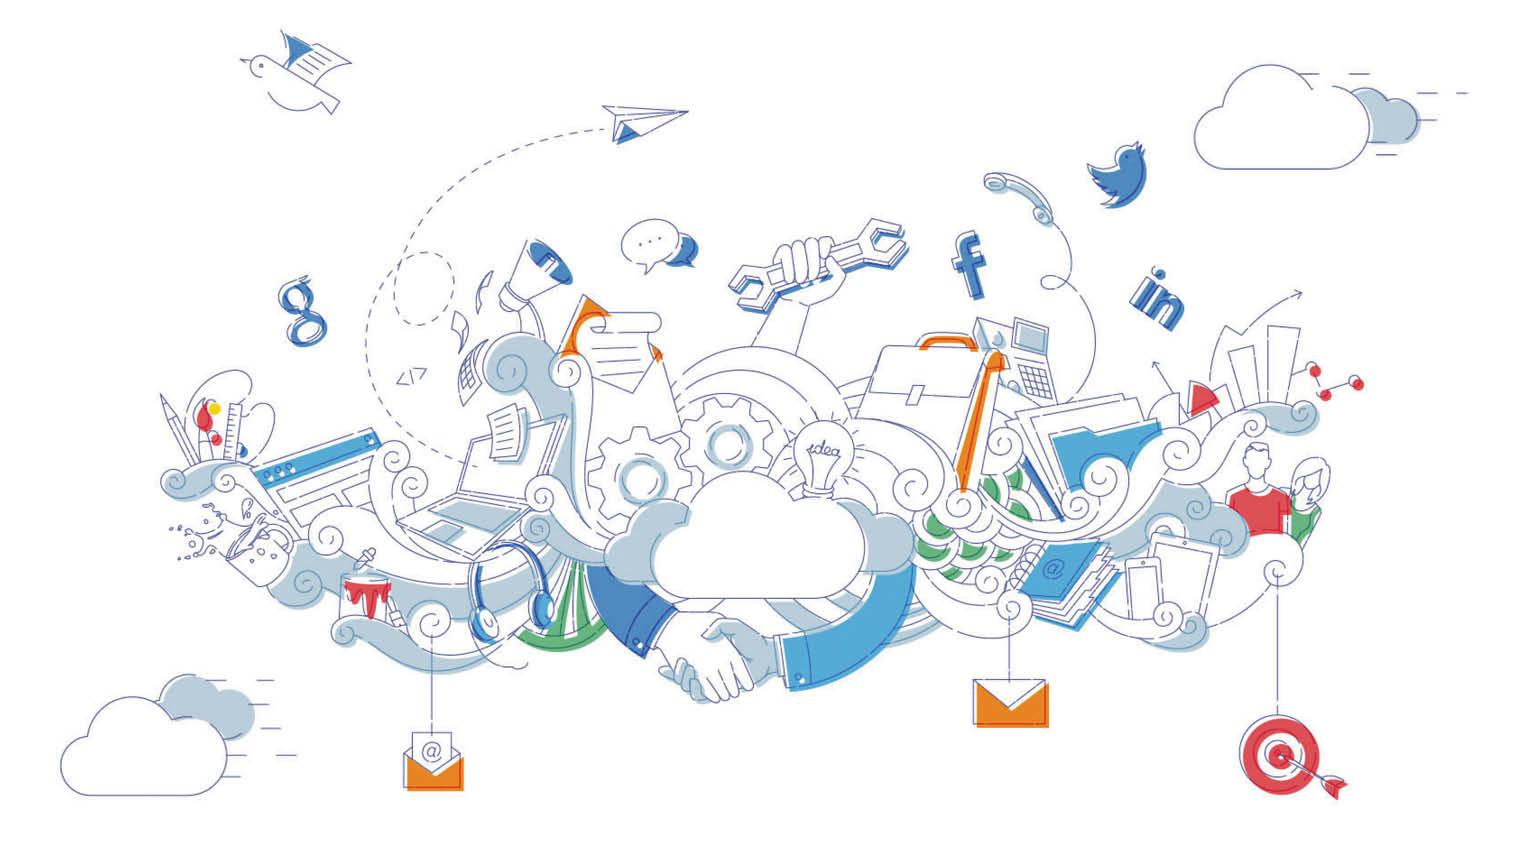 Cloud transformation illustration